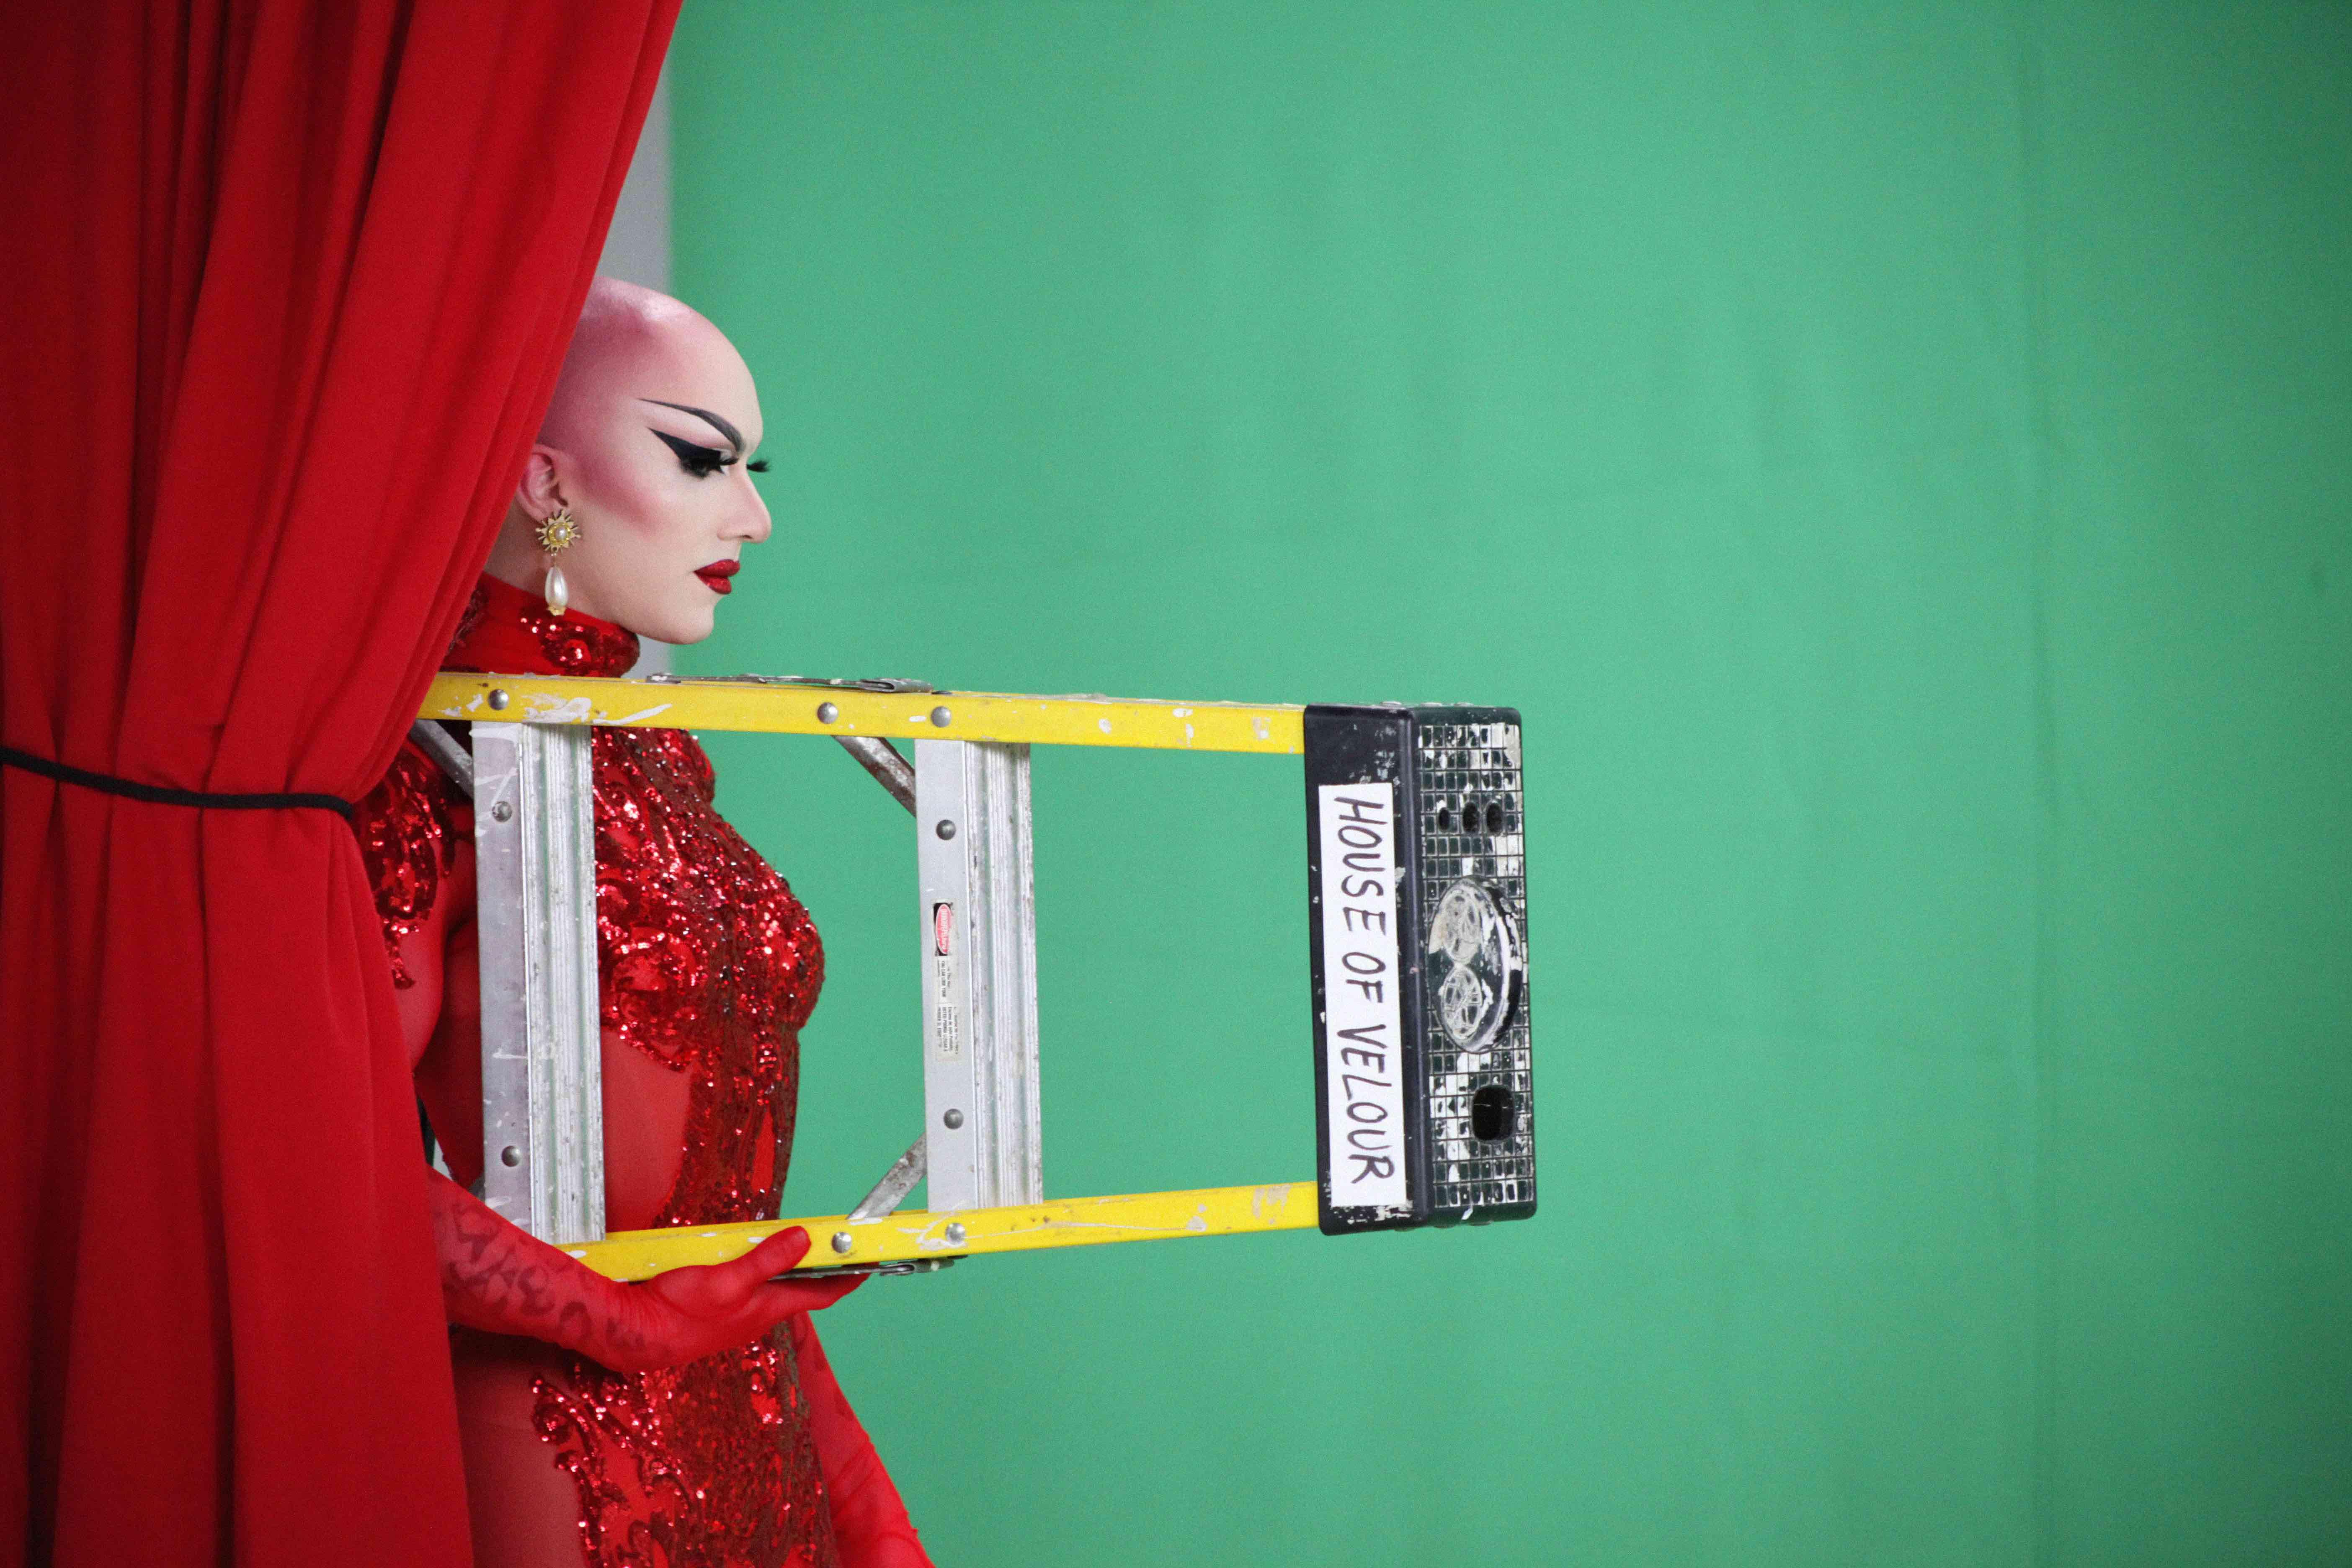 Sasha Velour behind the scenes of